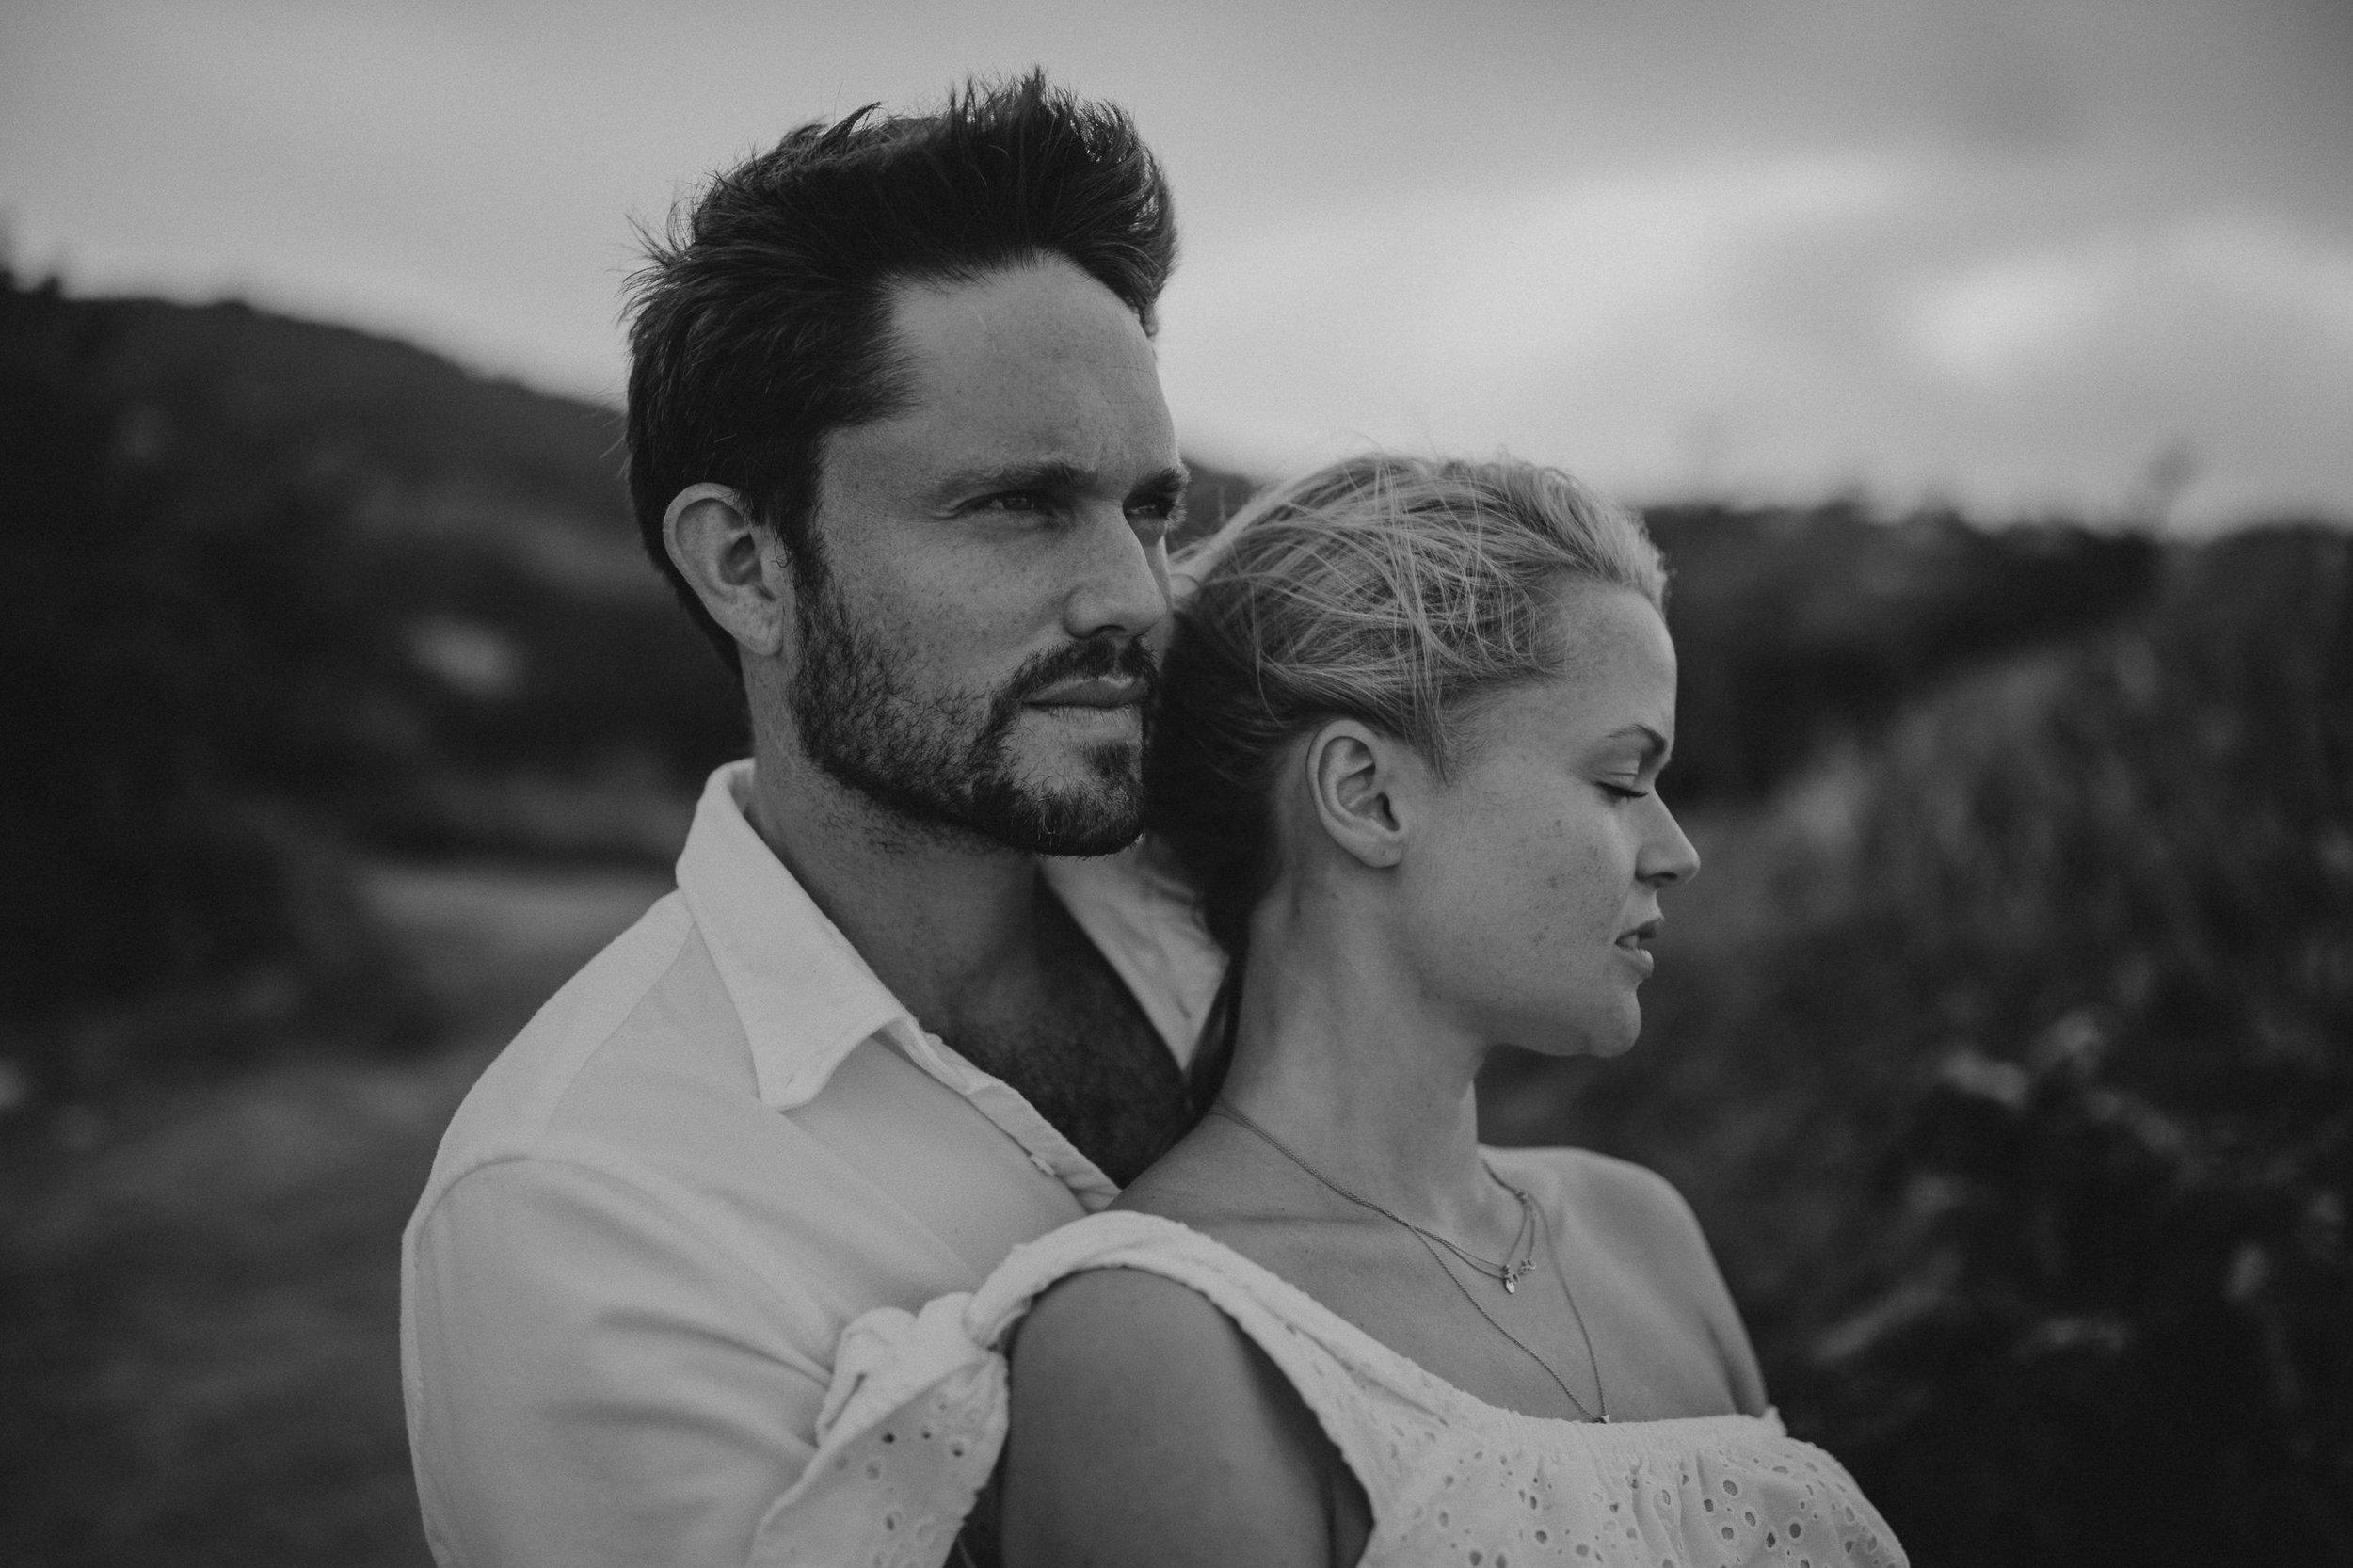 barbados_wedding_portrait_photographer_45.jpg